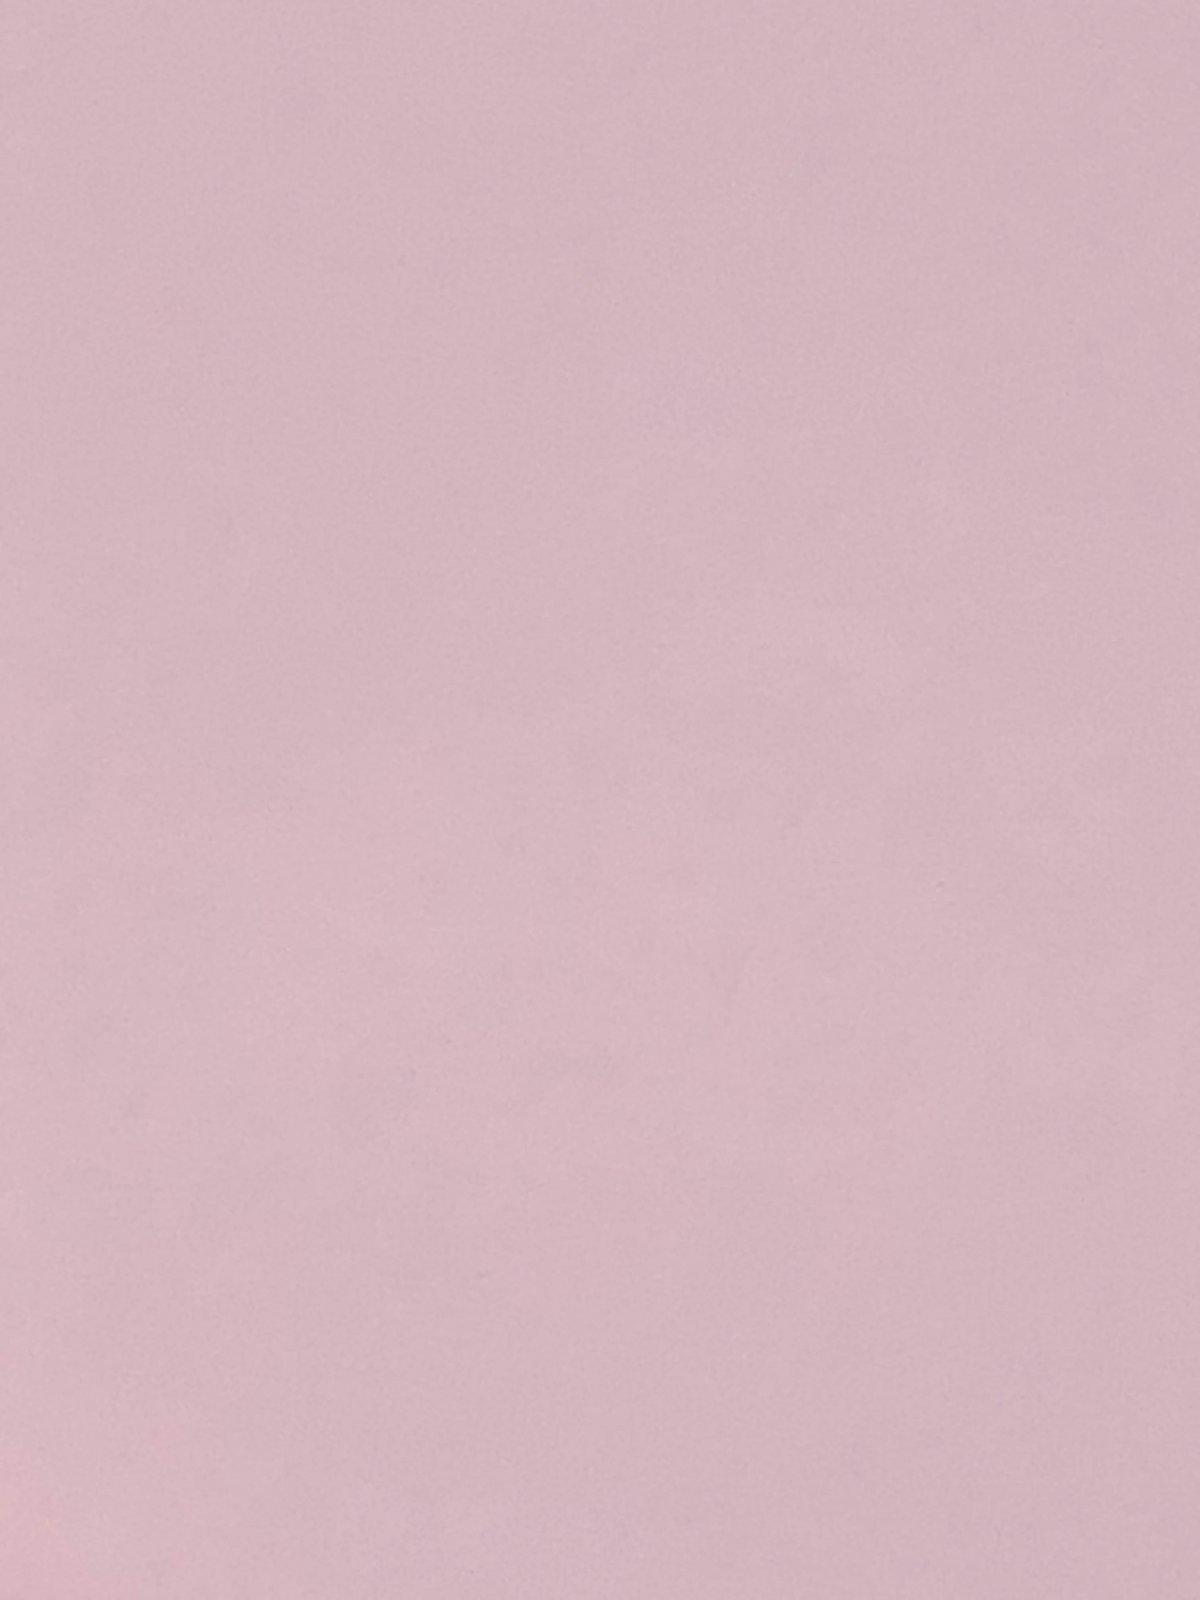 Stahls' Light Pink Fashion-Film Heat Transfer Vinyl 12 x 15